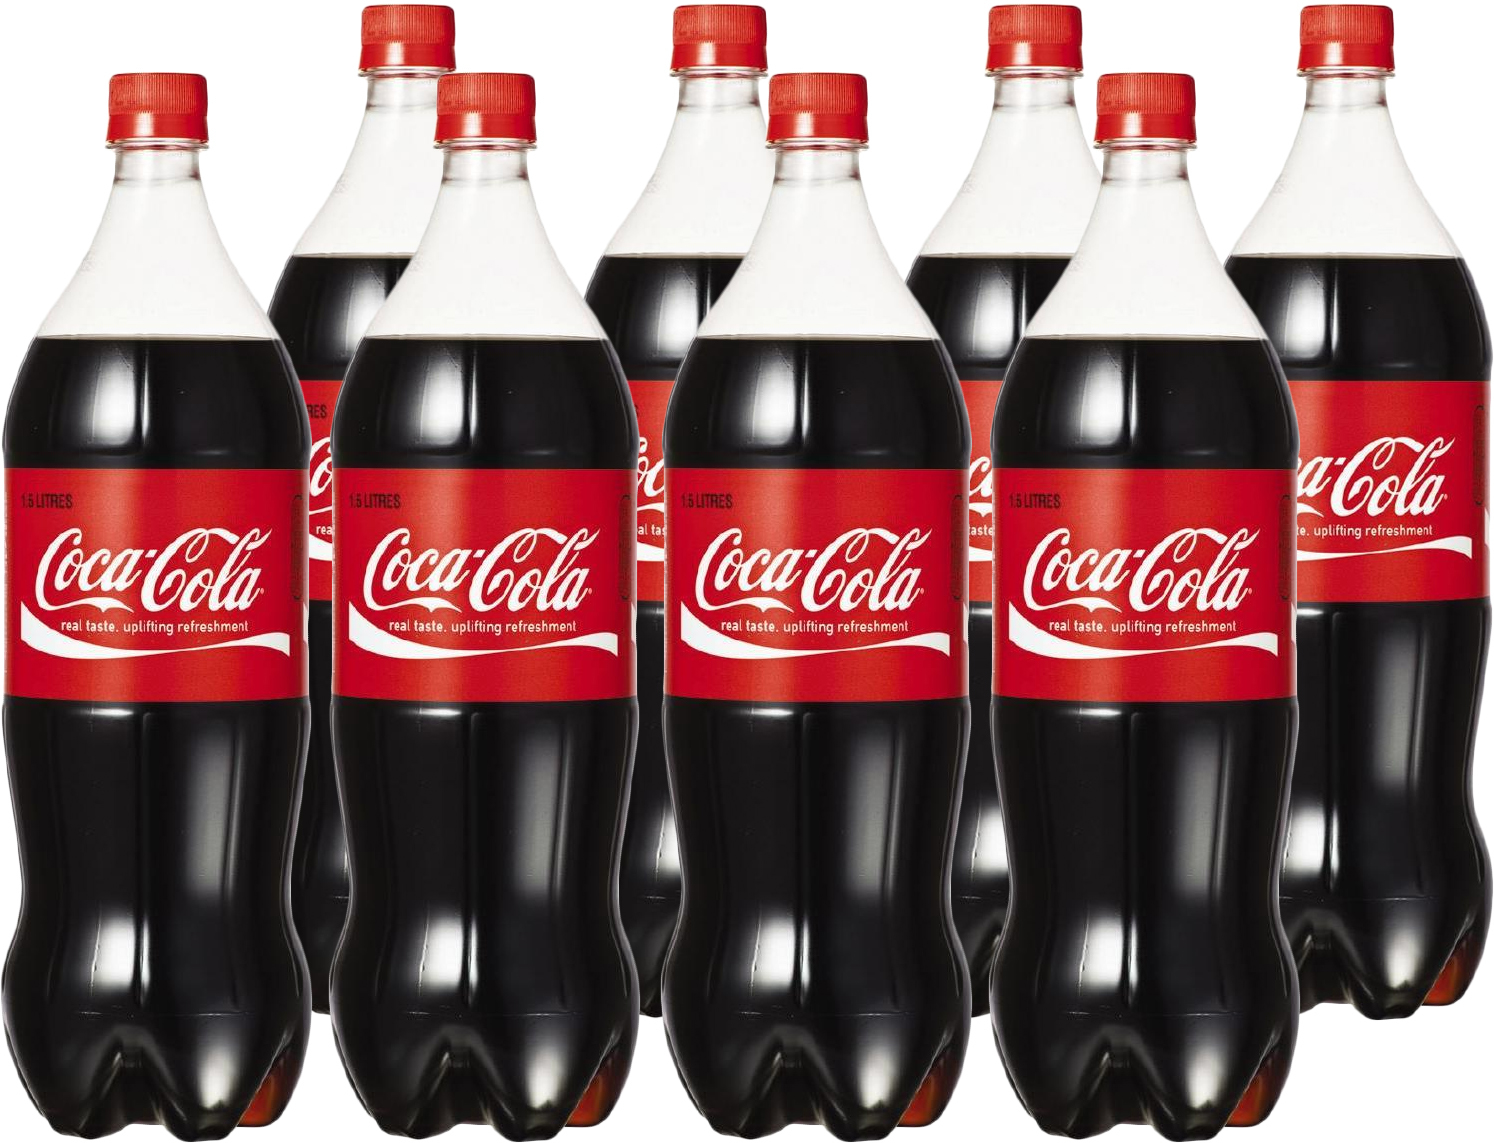 Coca-cola Soft Drink (1.5l X 8) image